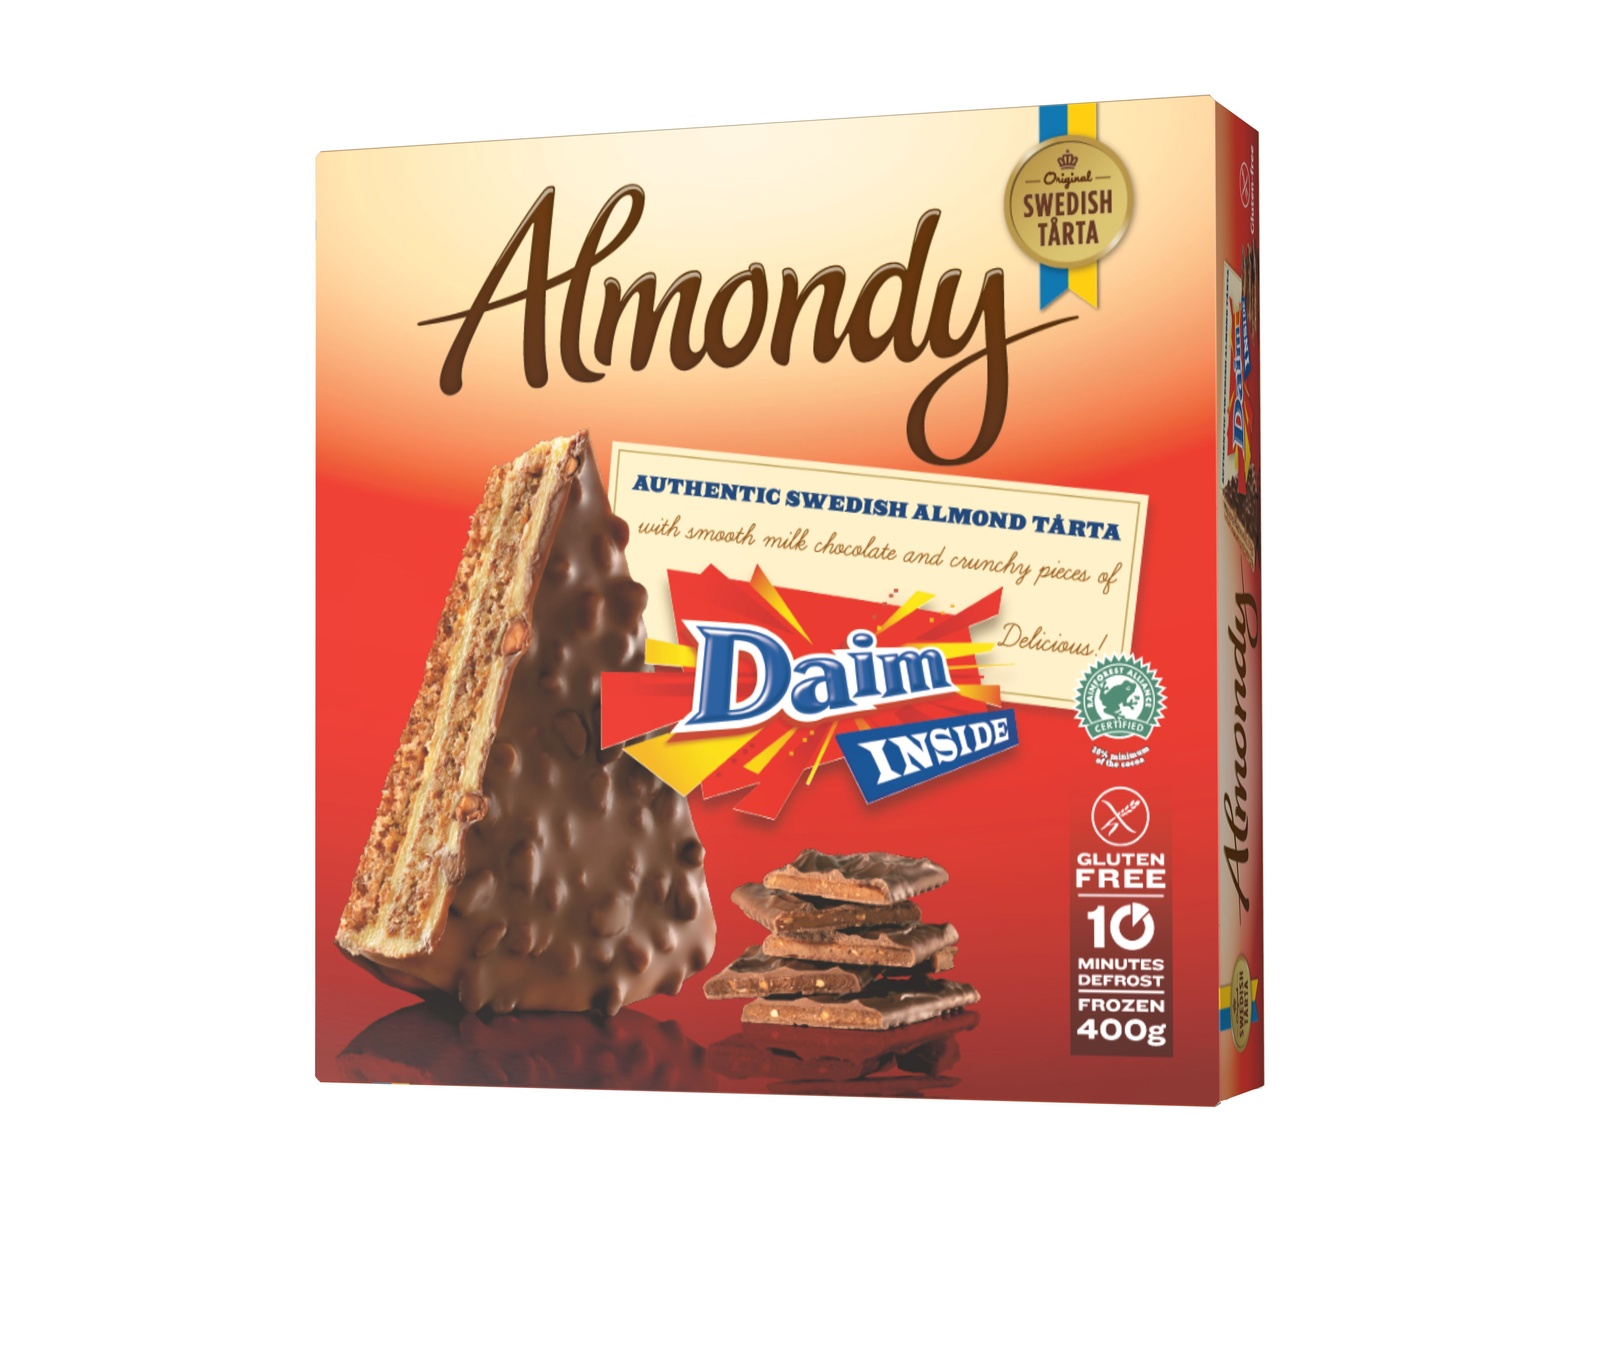 Миндальный торт Daim (ТМ Almondy) БЕЗ ГЛЮТЕНА 400г*12